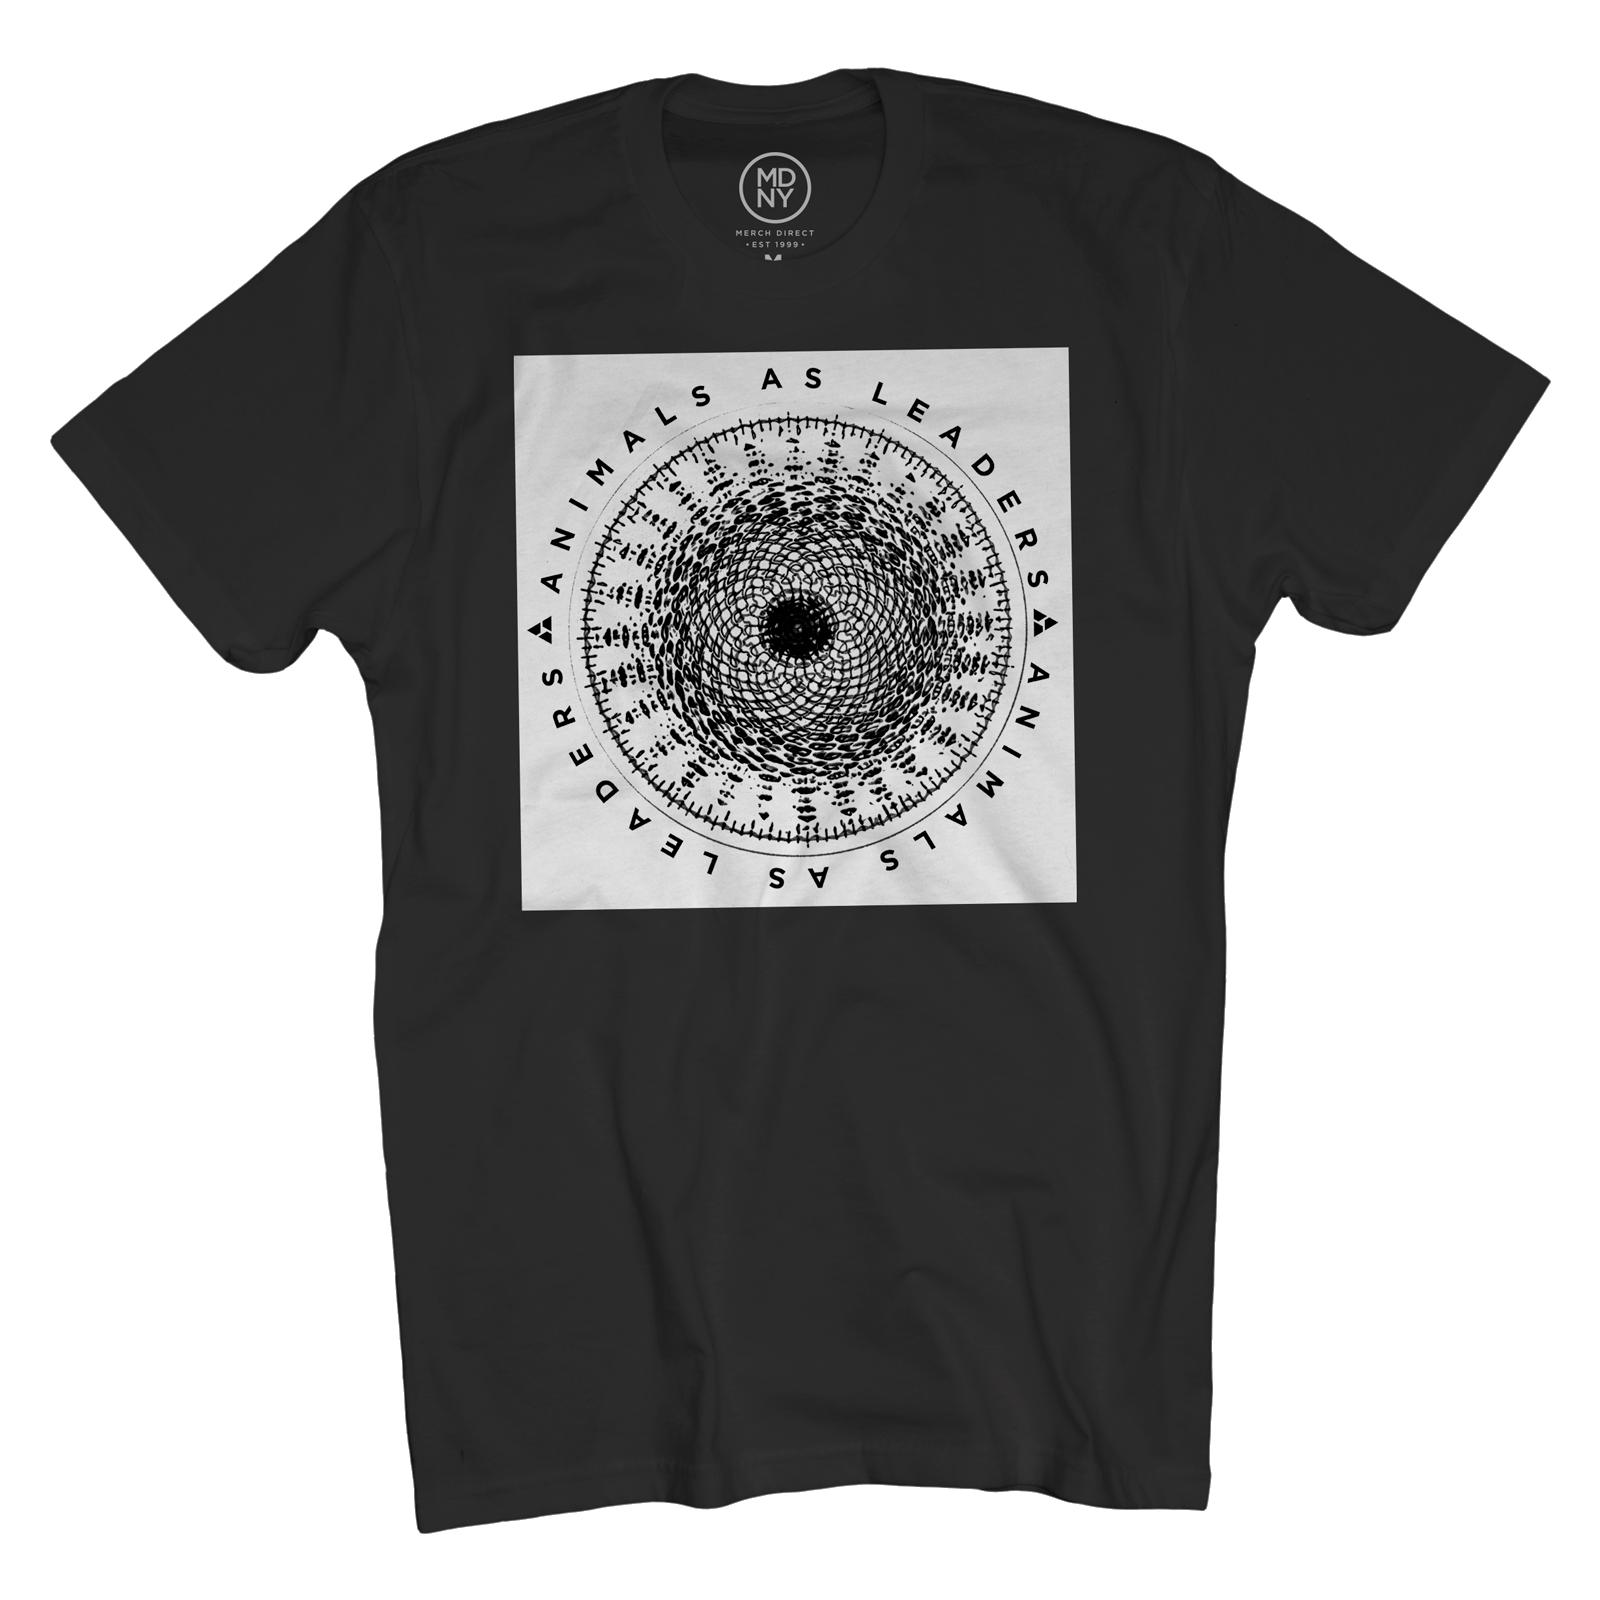 Spiro Text on Black T-Shirt